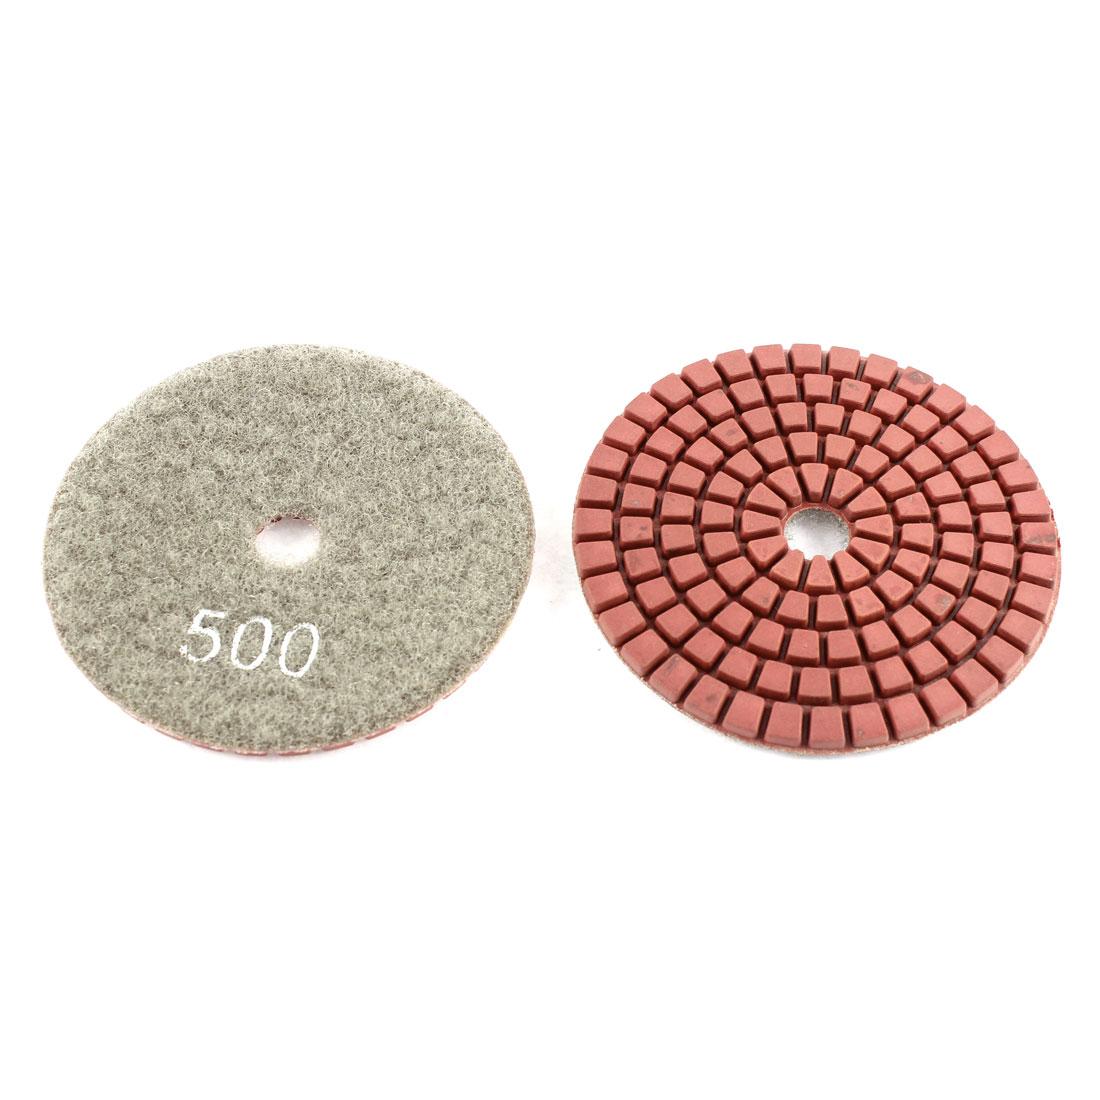 "2pcs Wet Dry Granite Concrete Marble Diamond Polishing Pad Polisher 3"" Red Gray"